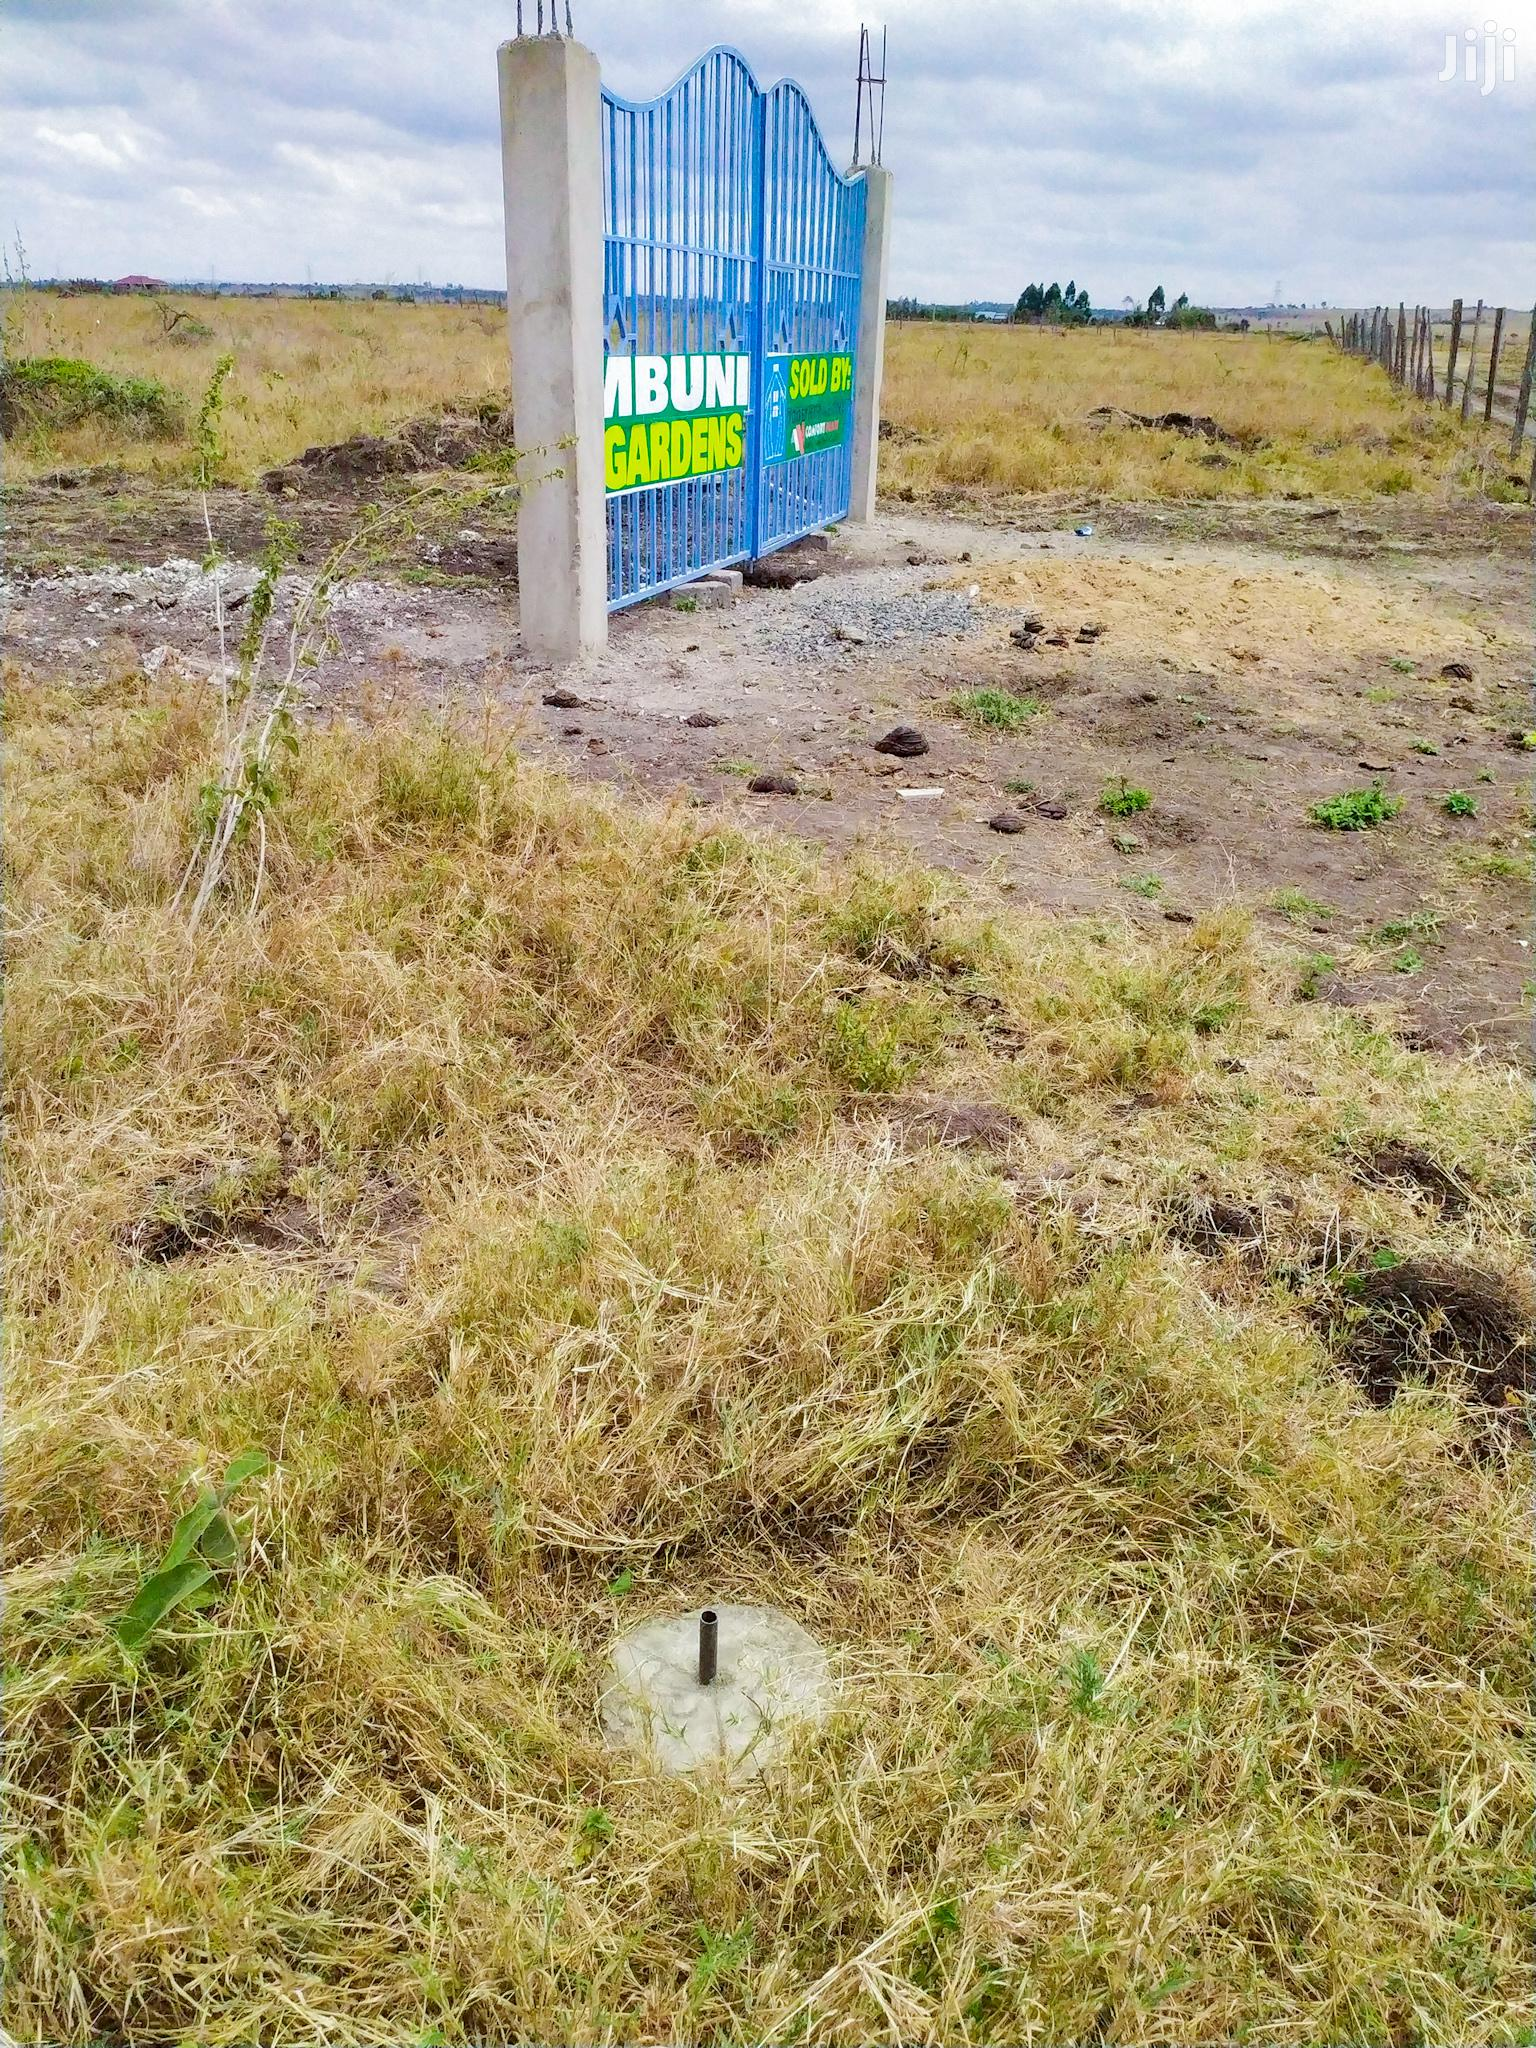 Archive: Mbuni Gardens, Kitengela